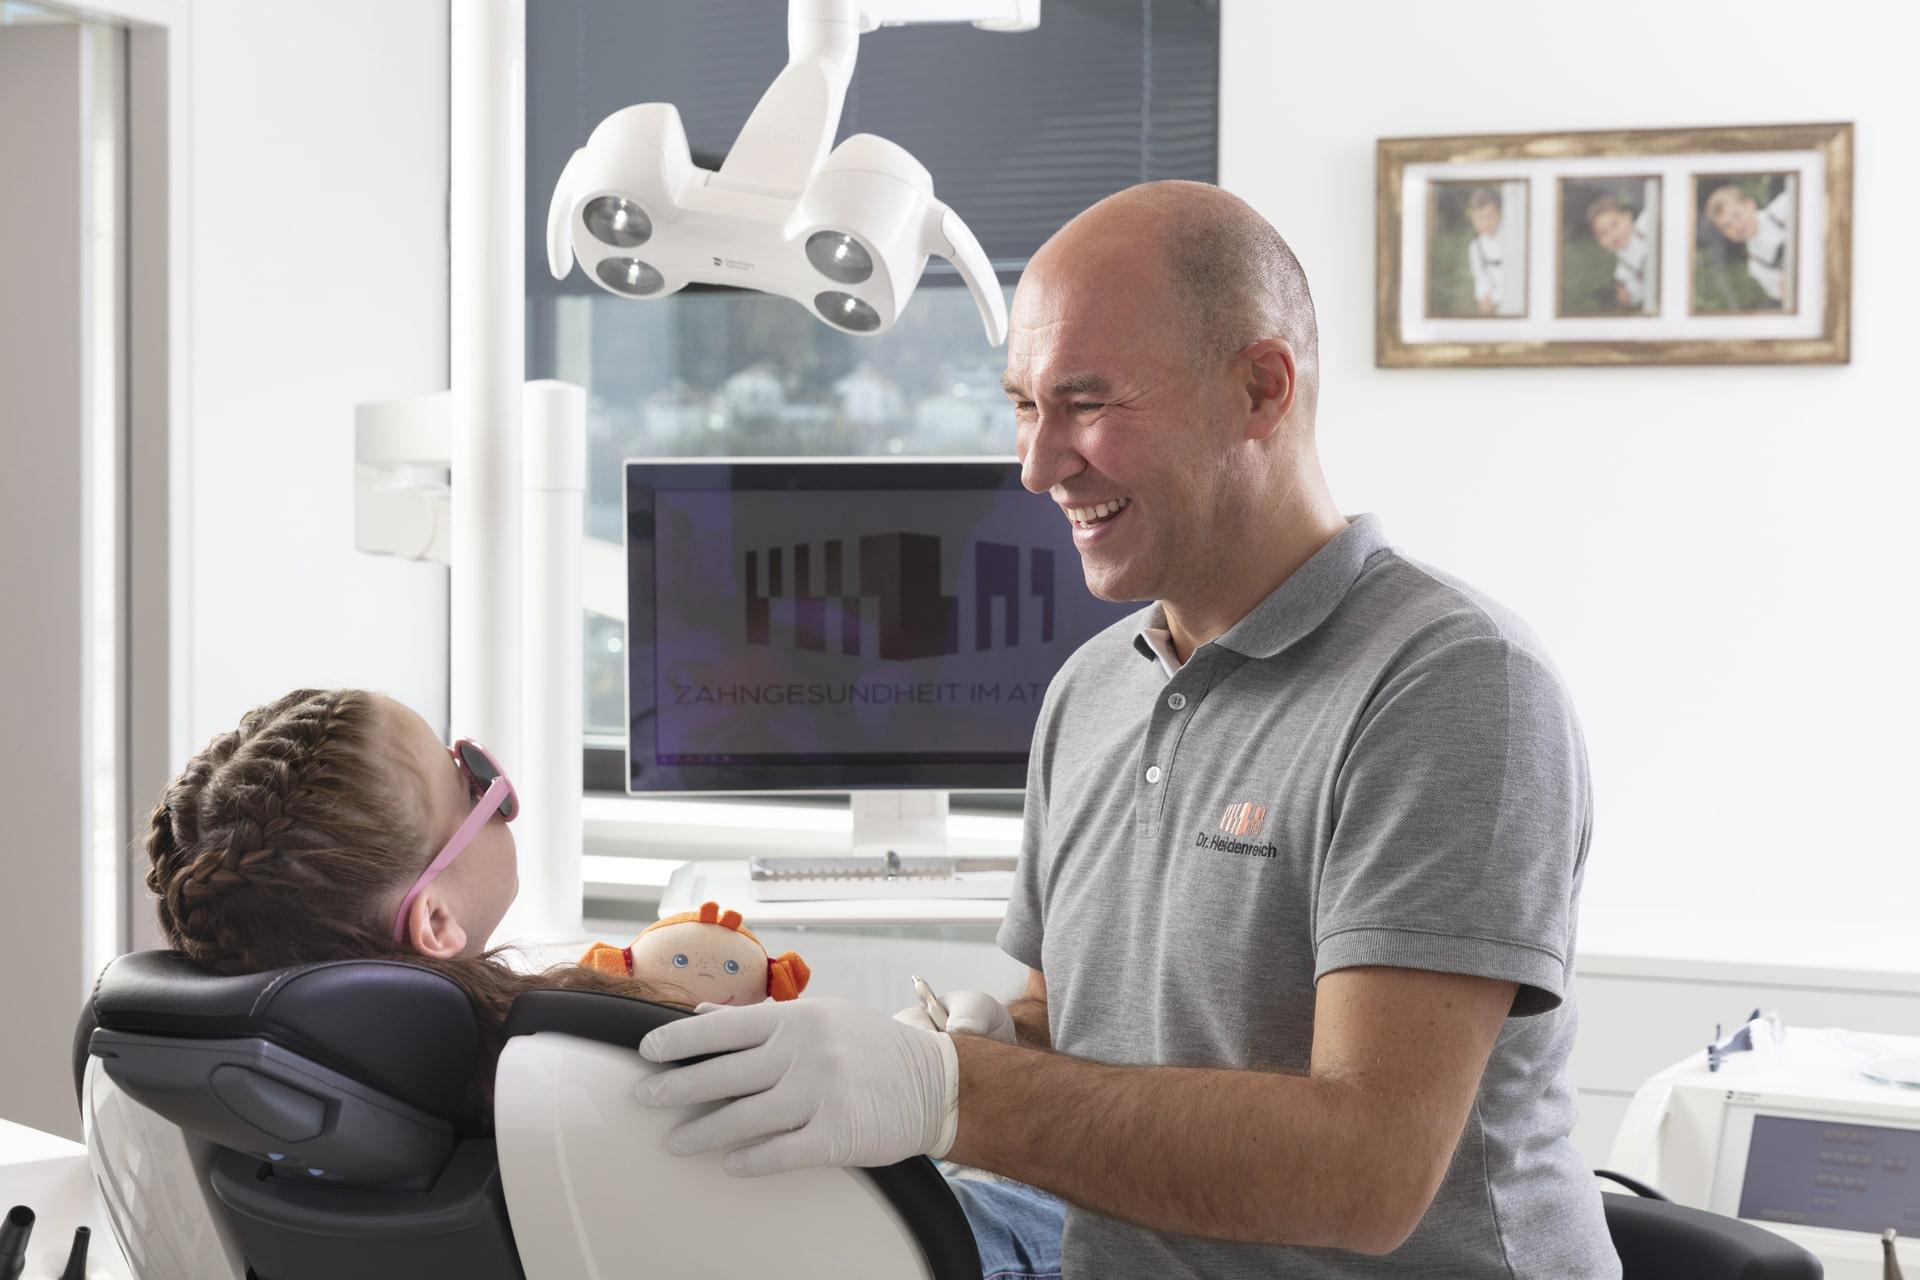 Kinder Zahnarzt Innsbruck - Ordination Dr. Lars Heidenreich